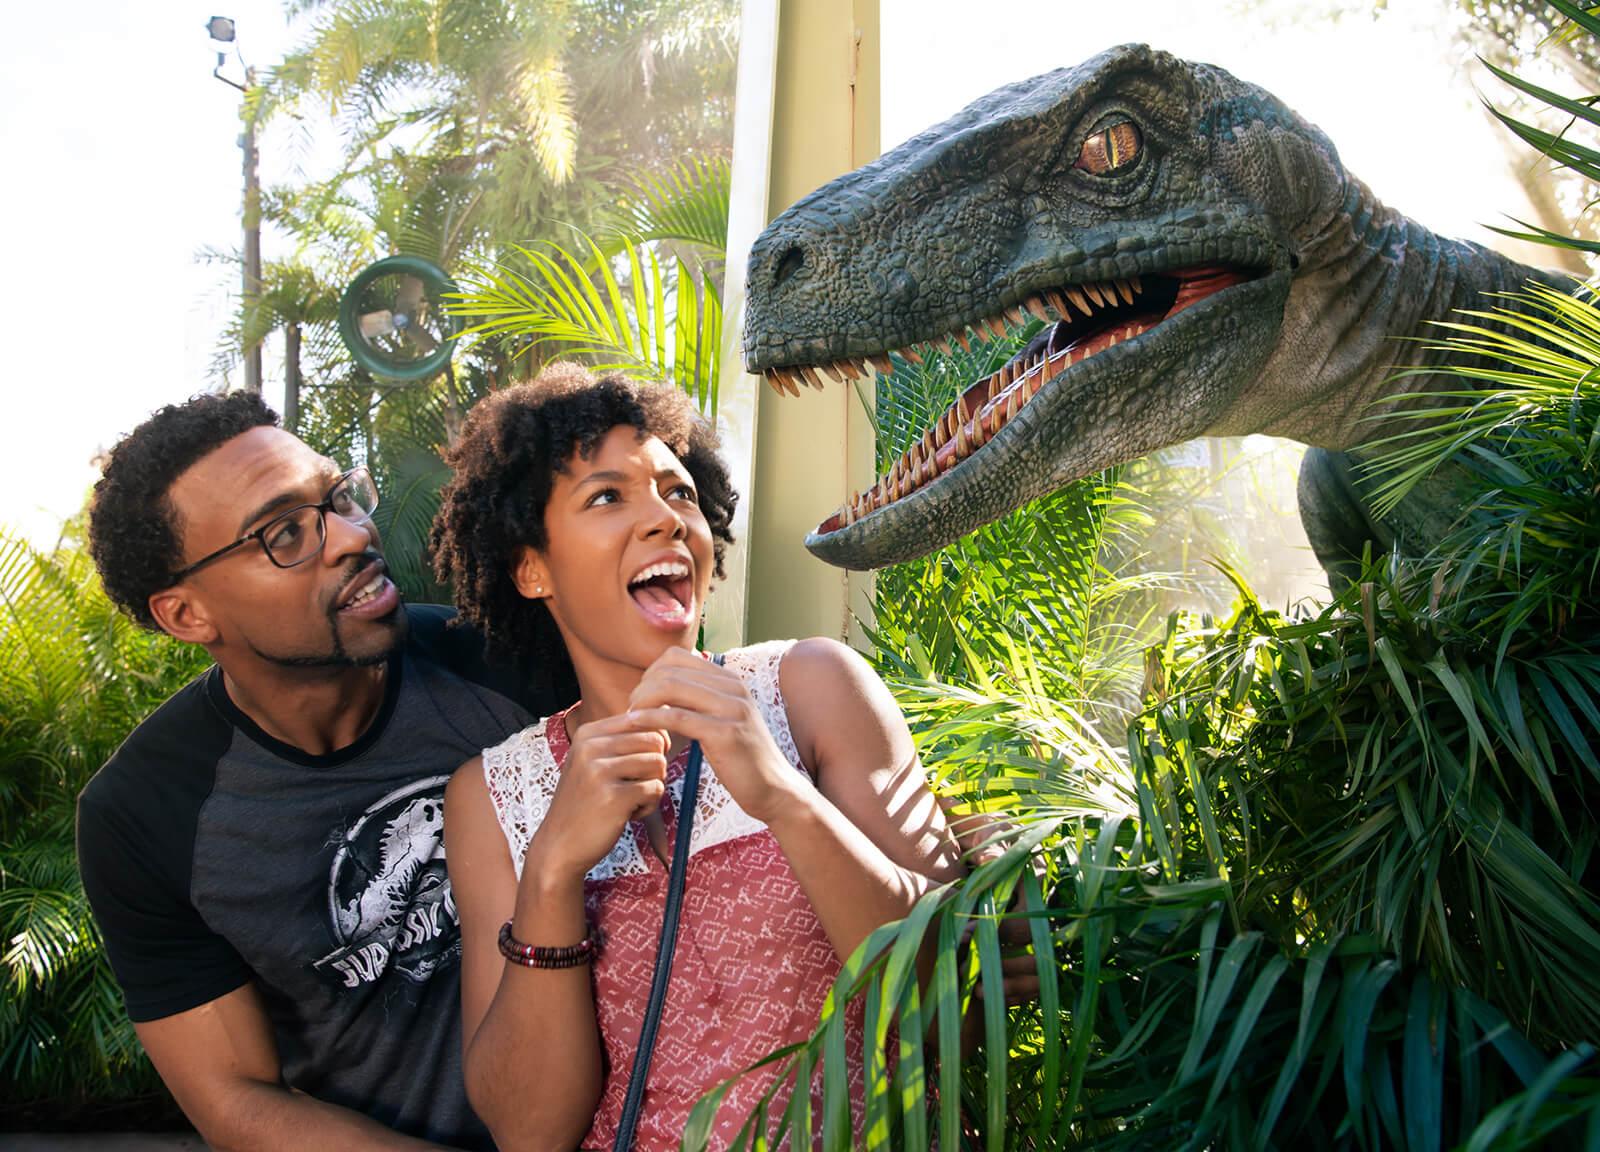 Jurassic Park at Universal Florida